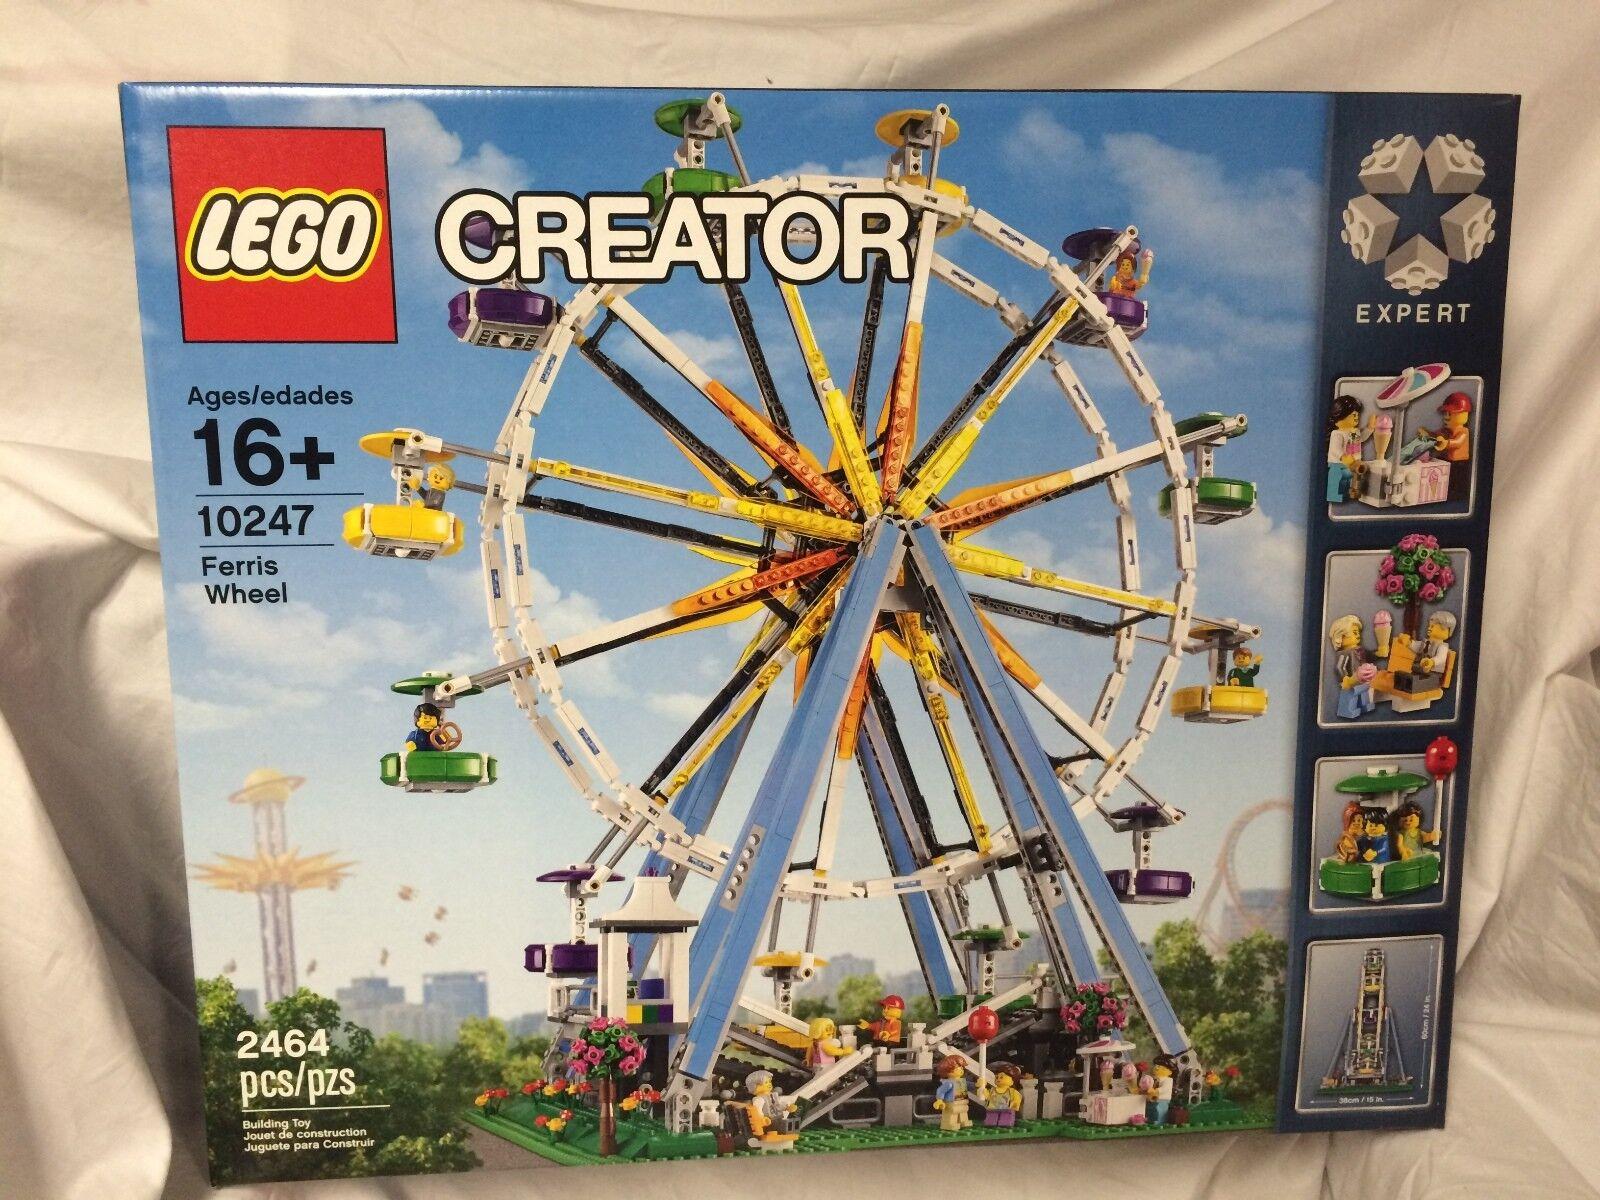 Lego Creator 10247 Ferris Wheel BRAND NEW Sealed PERFECT BOX Retirosso set